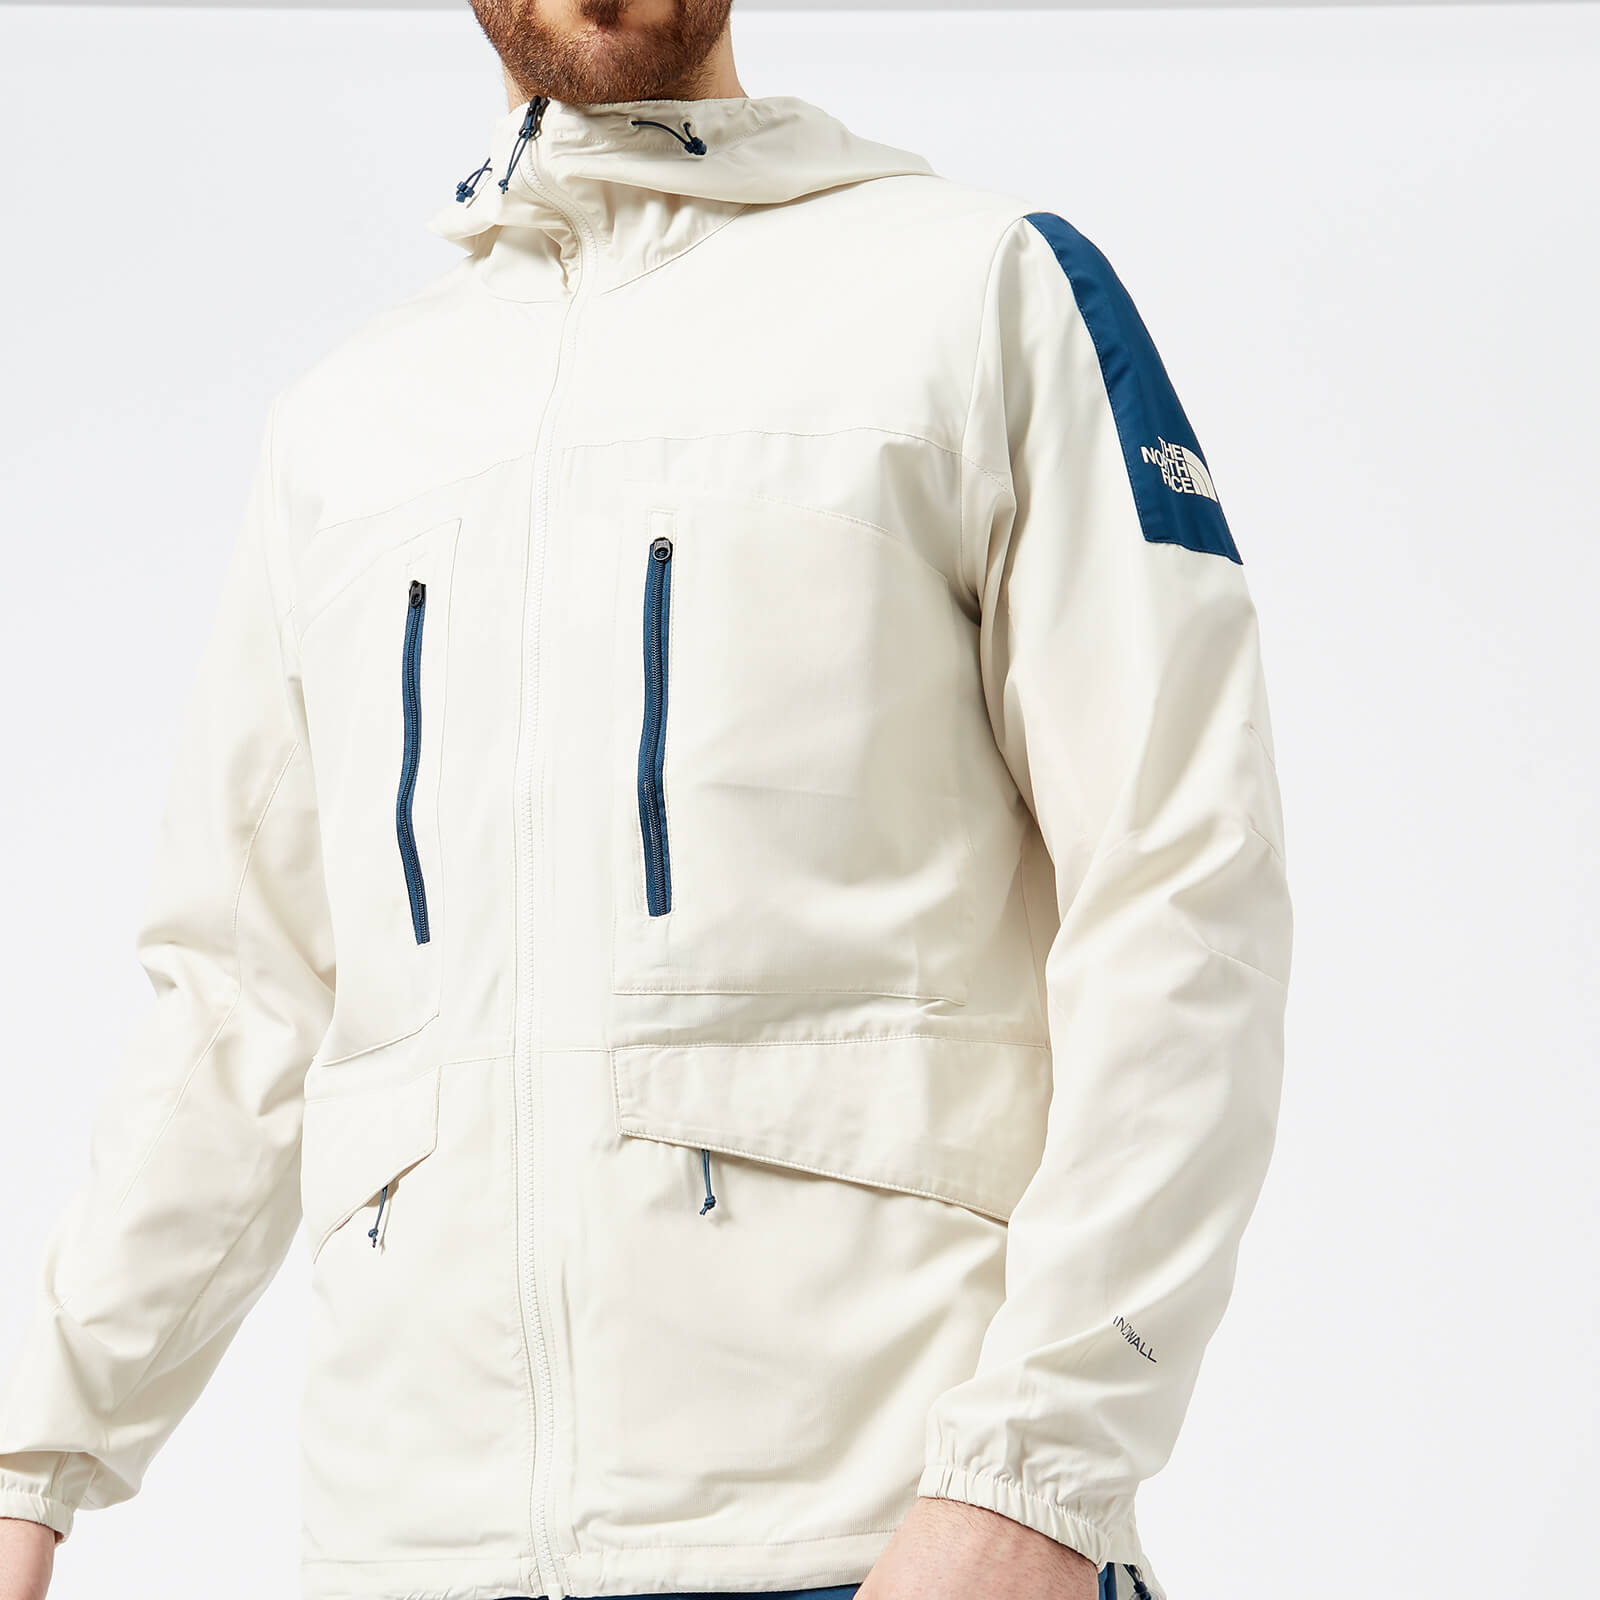 3c81e7359 The North Face Men's Fantasy Ridge Light Jacket - Vintage White ...